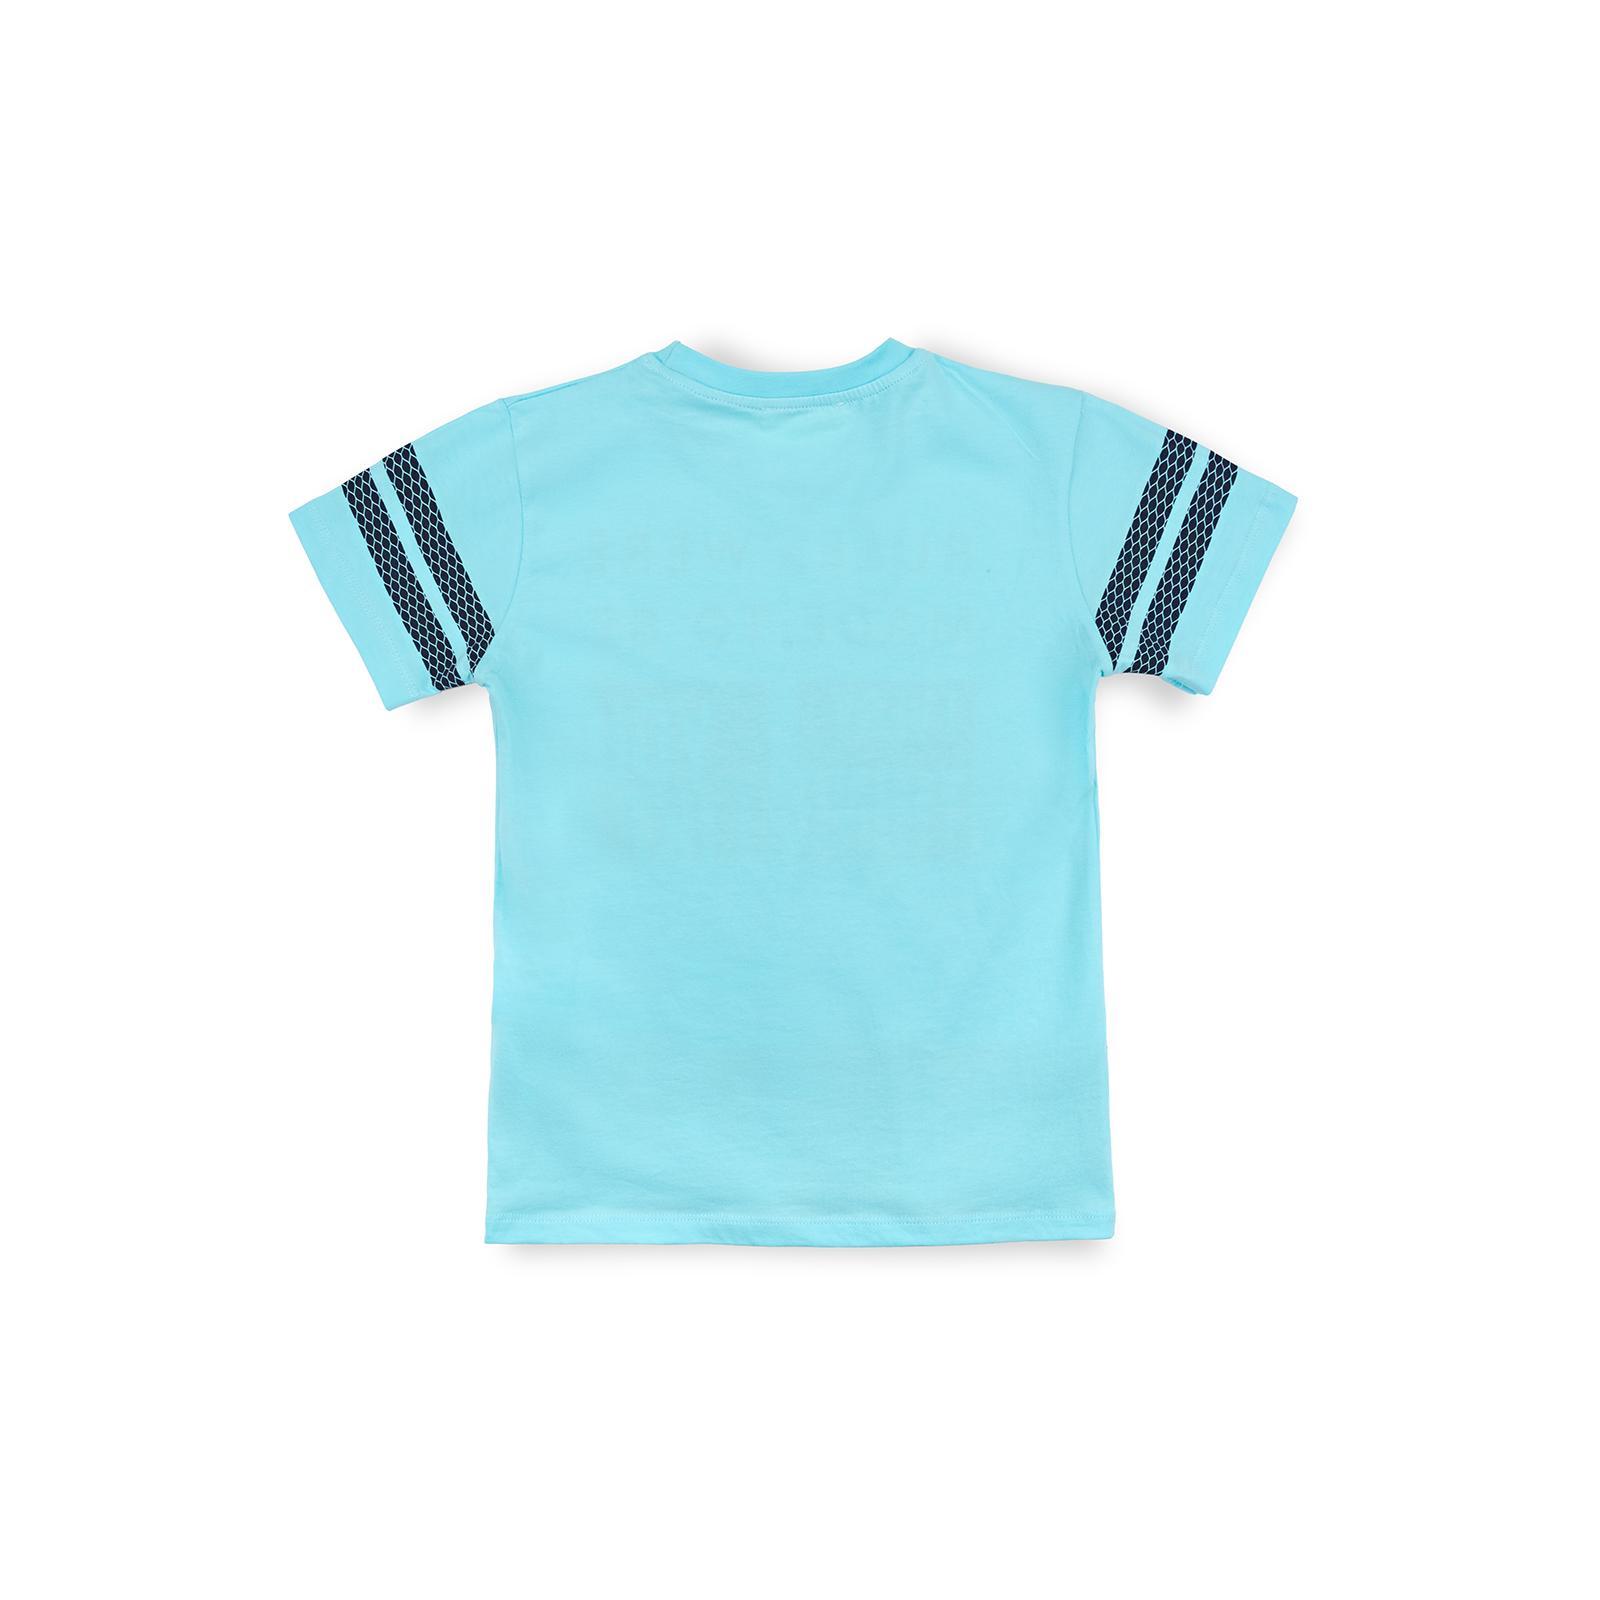 "Футболка детская Breeze ""Every thing you like"" (10980-134B-blue) изображение 2"